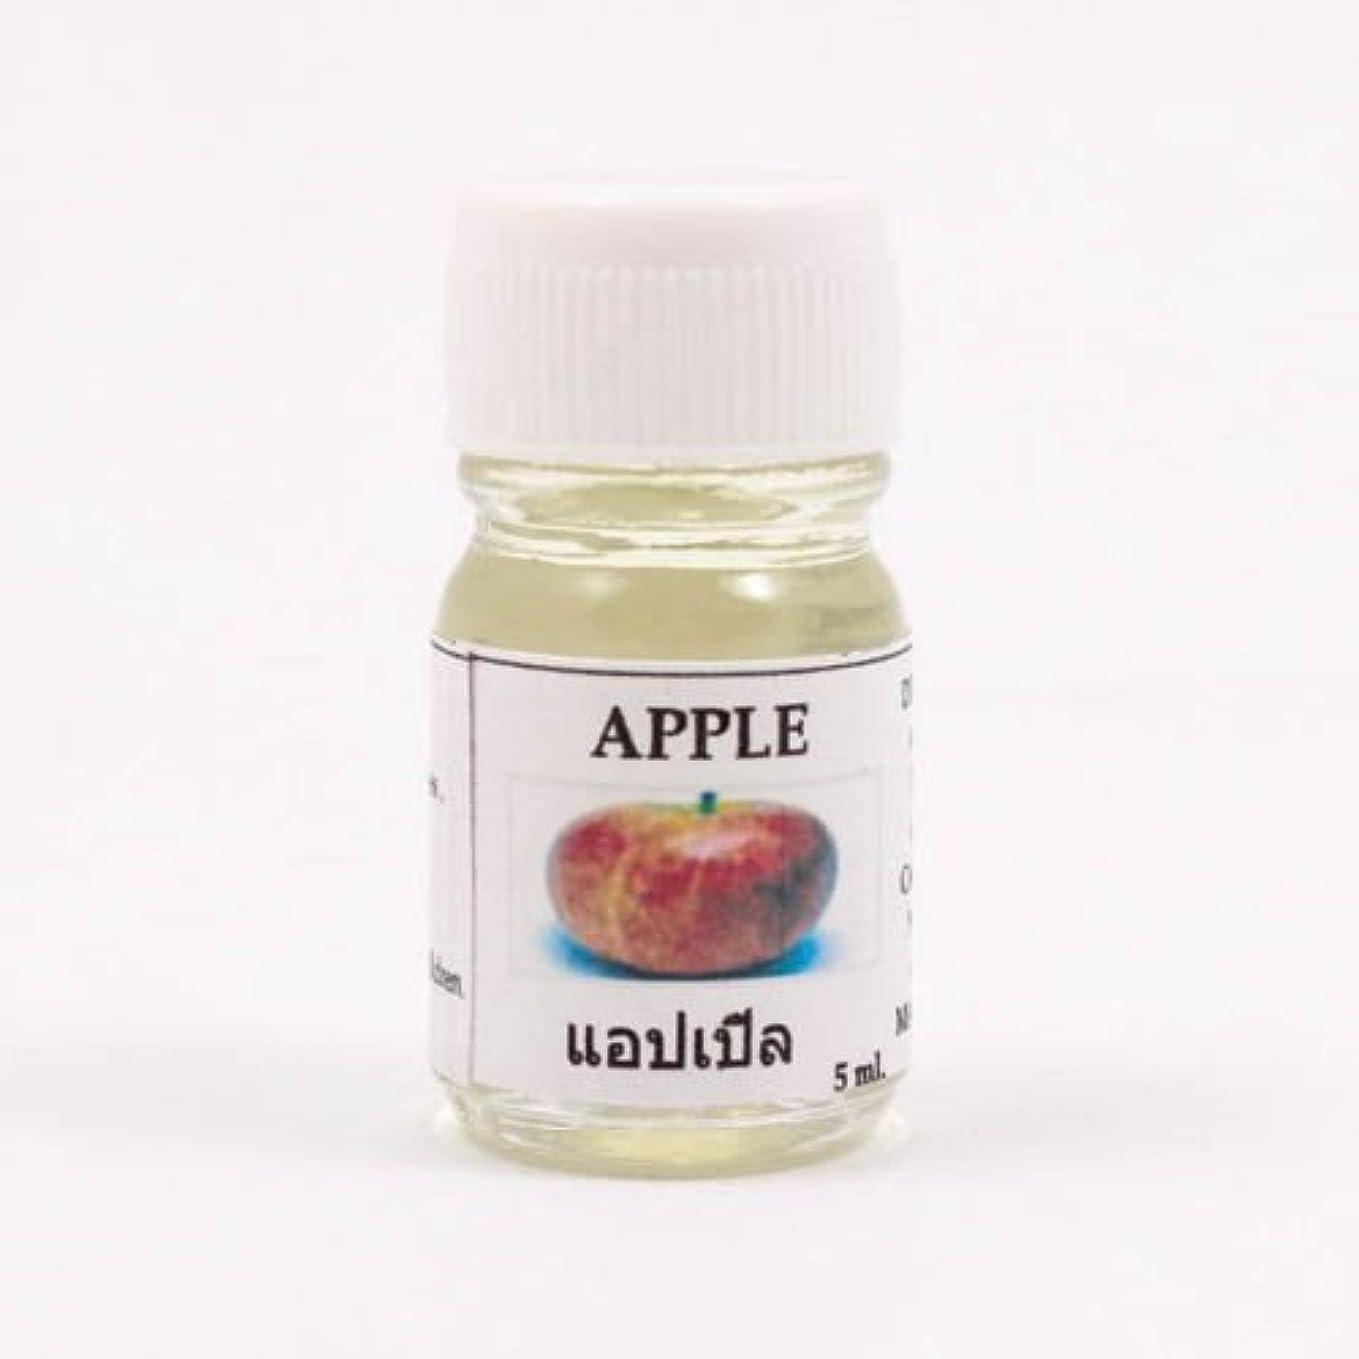 6X Apple Aroma Fragrance Essential Oil 5ML cc Diffuser Burner Therapy